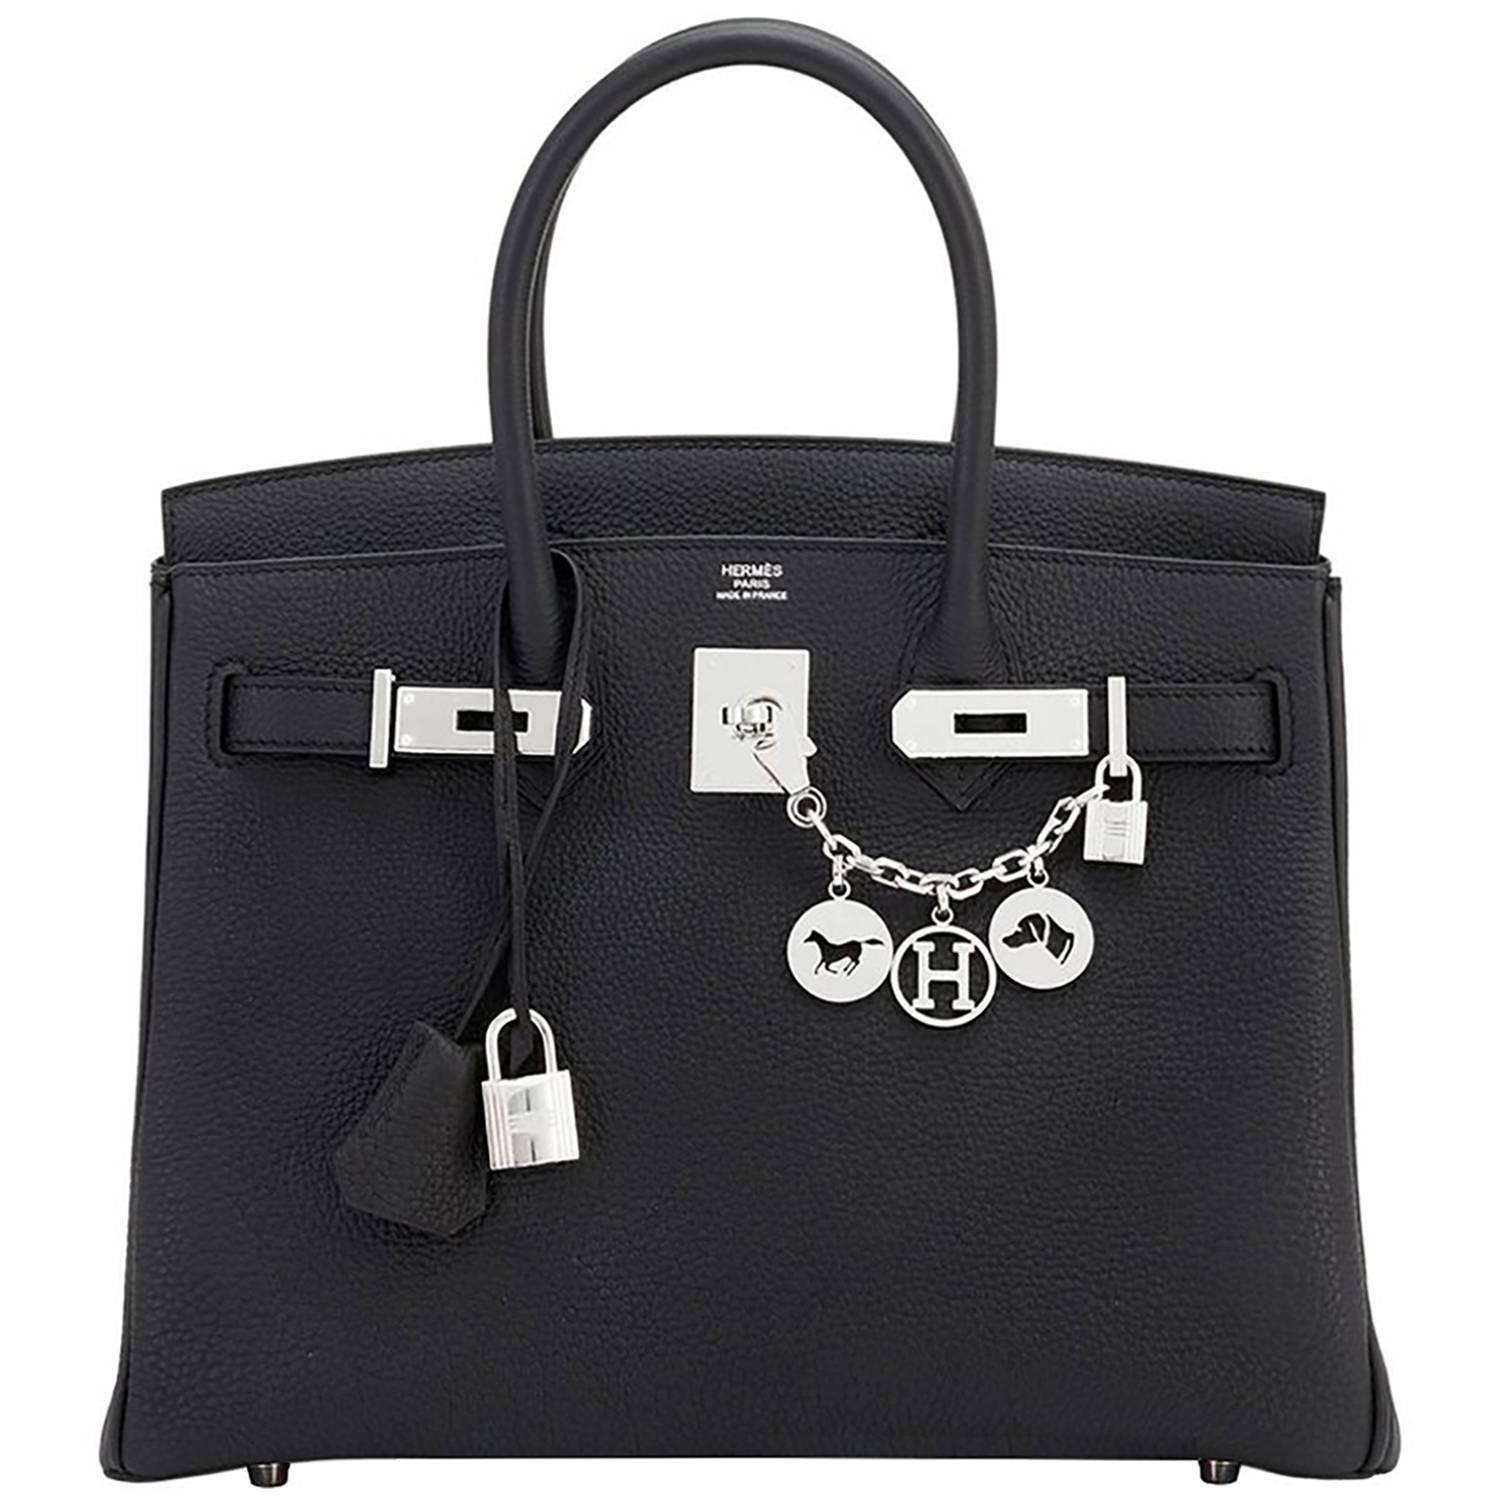 c822d260d6f0 Orange Hermes Bags - 340 For Sale on 1stdibs